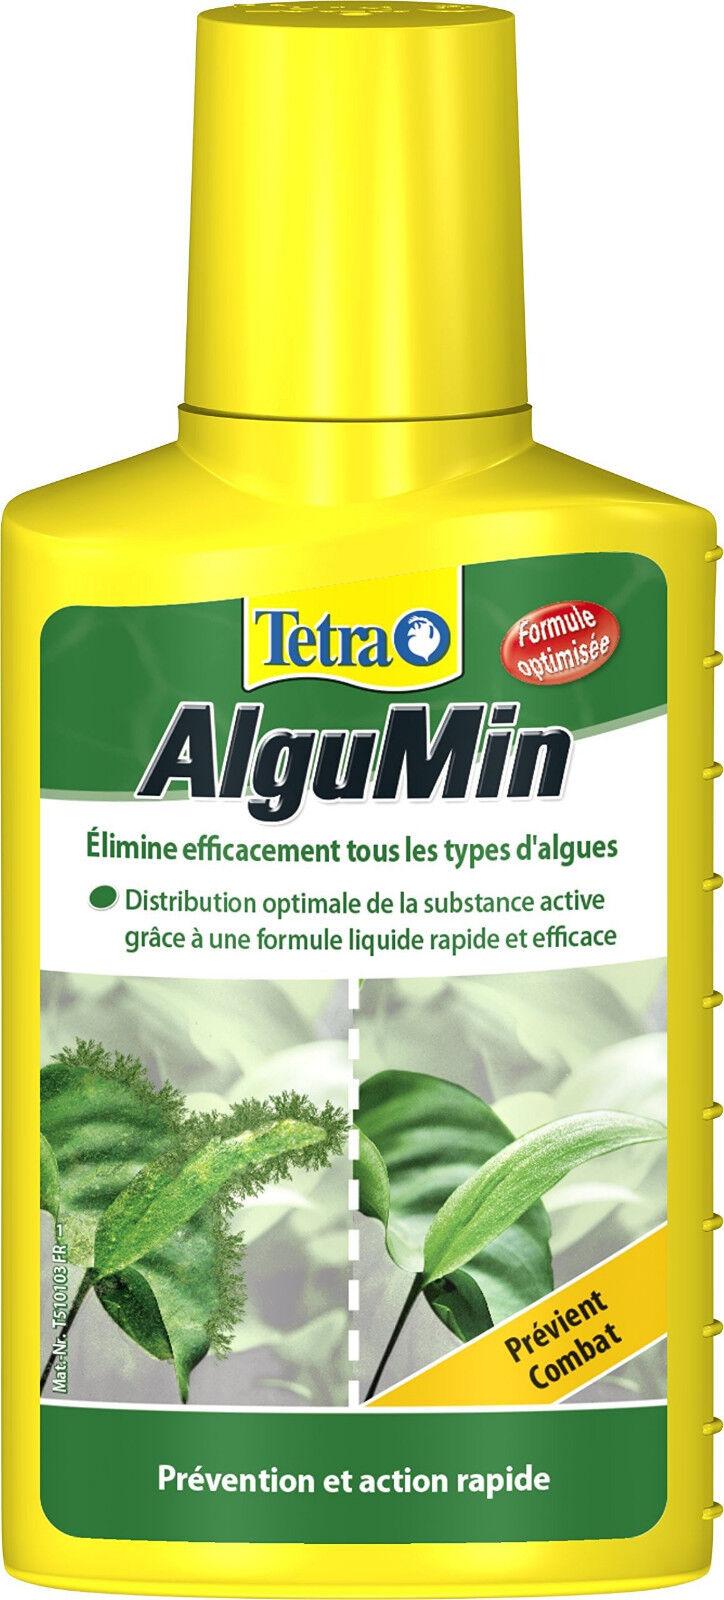 TETRA ALGUMIN 500ml anti algues (371016)